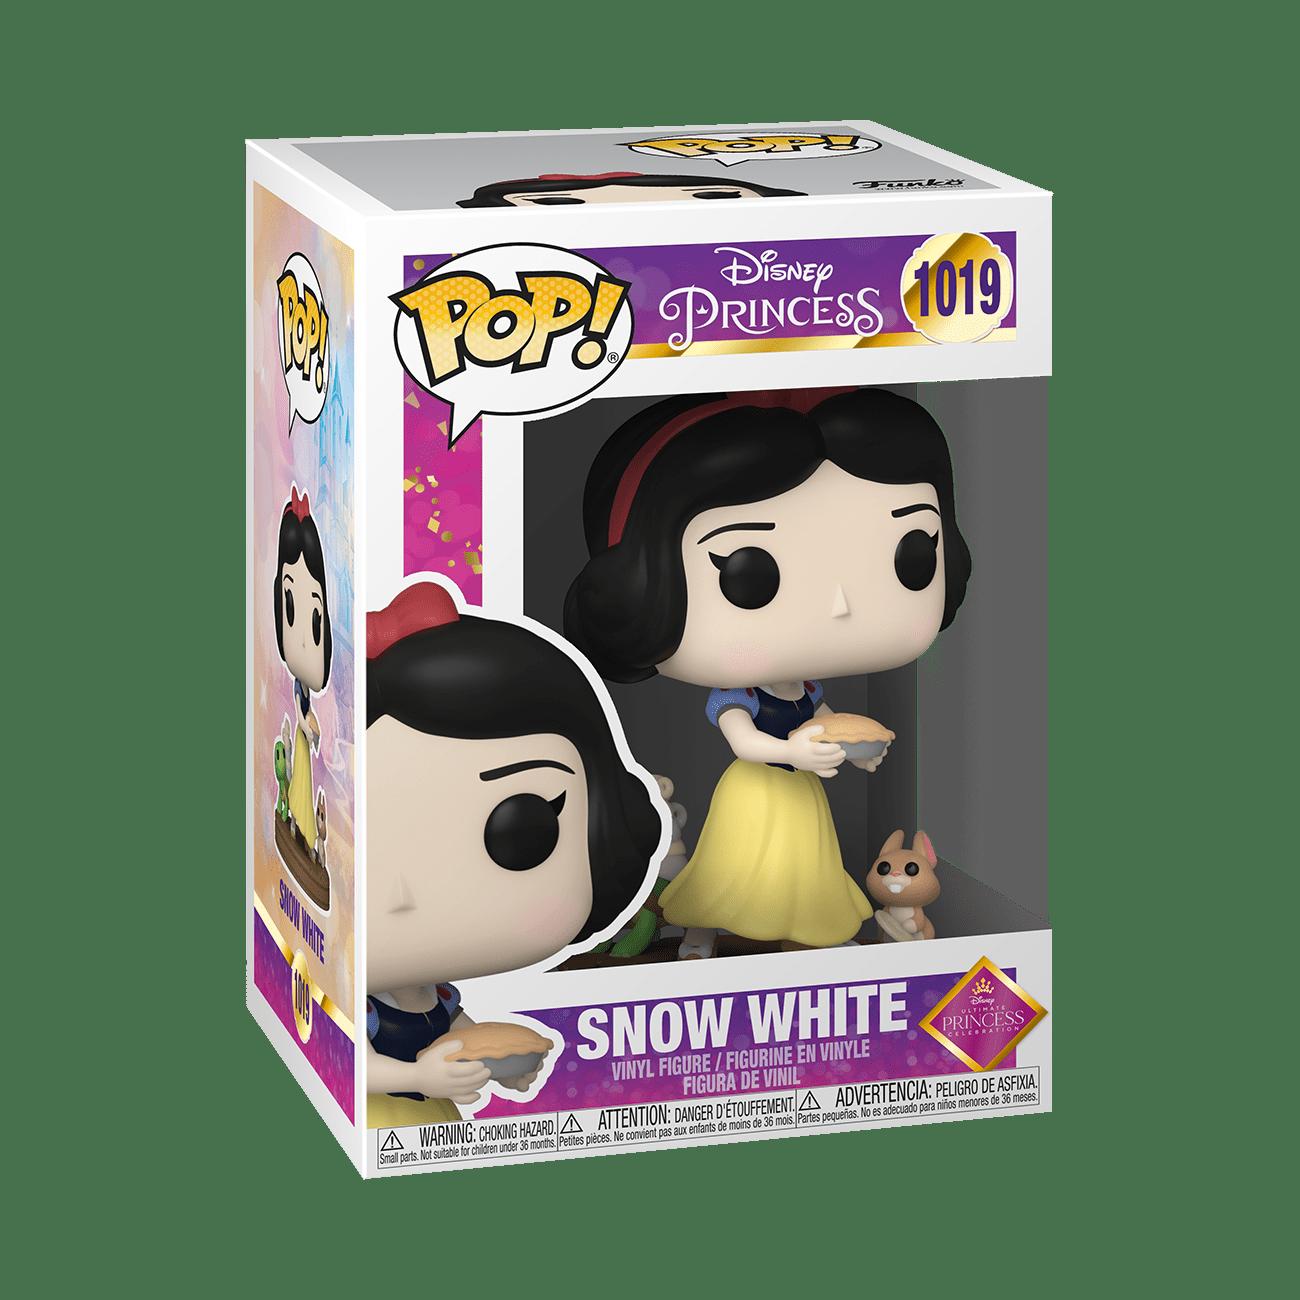 snow white ultimate princess funko pop!